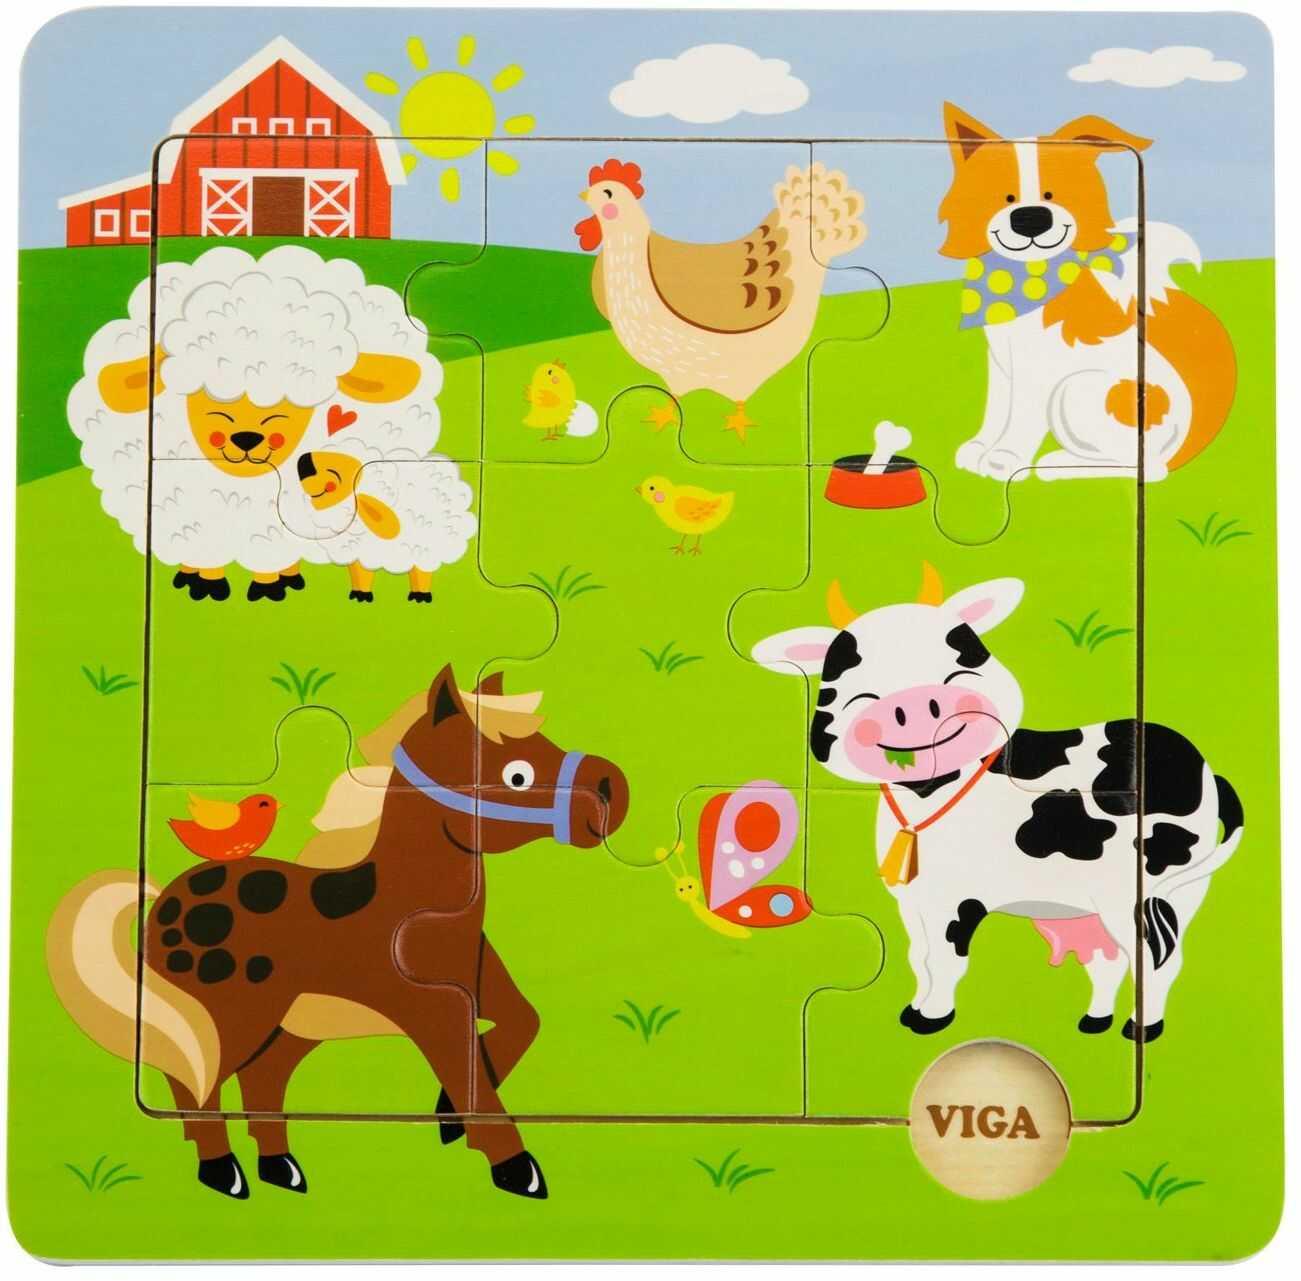 Viga Zabawki - 50837 - Puzzle Discovery - Gospodarstwo rolne